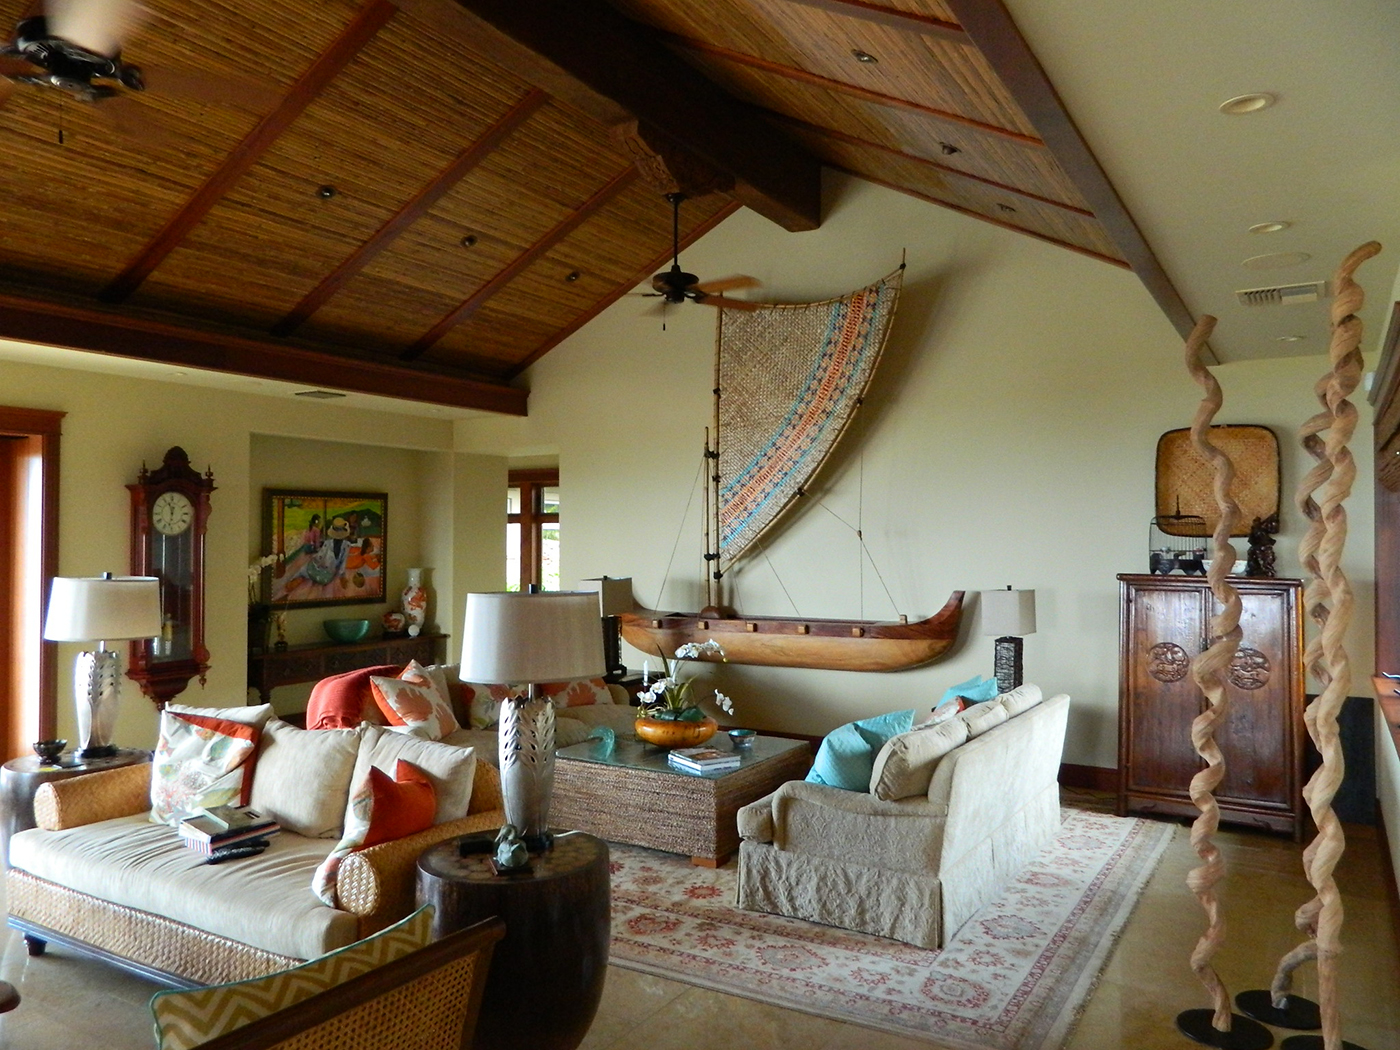 7 MAUI Residence - Living Room with custom Canoe sculpture.JPG